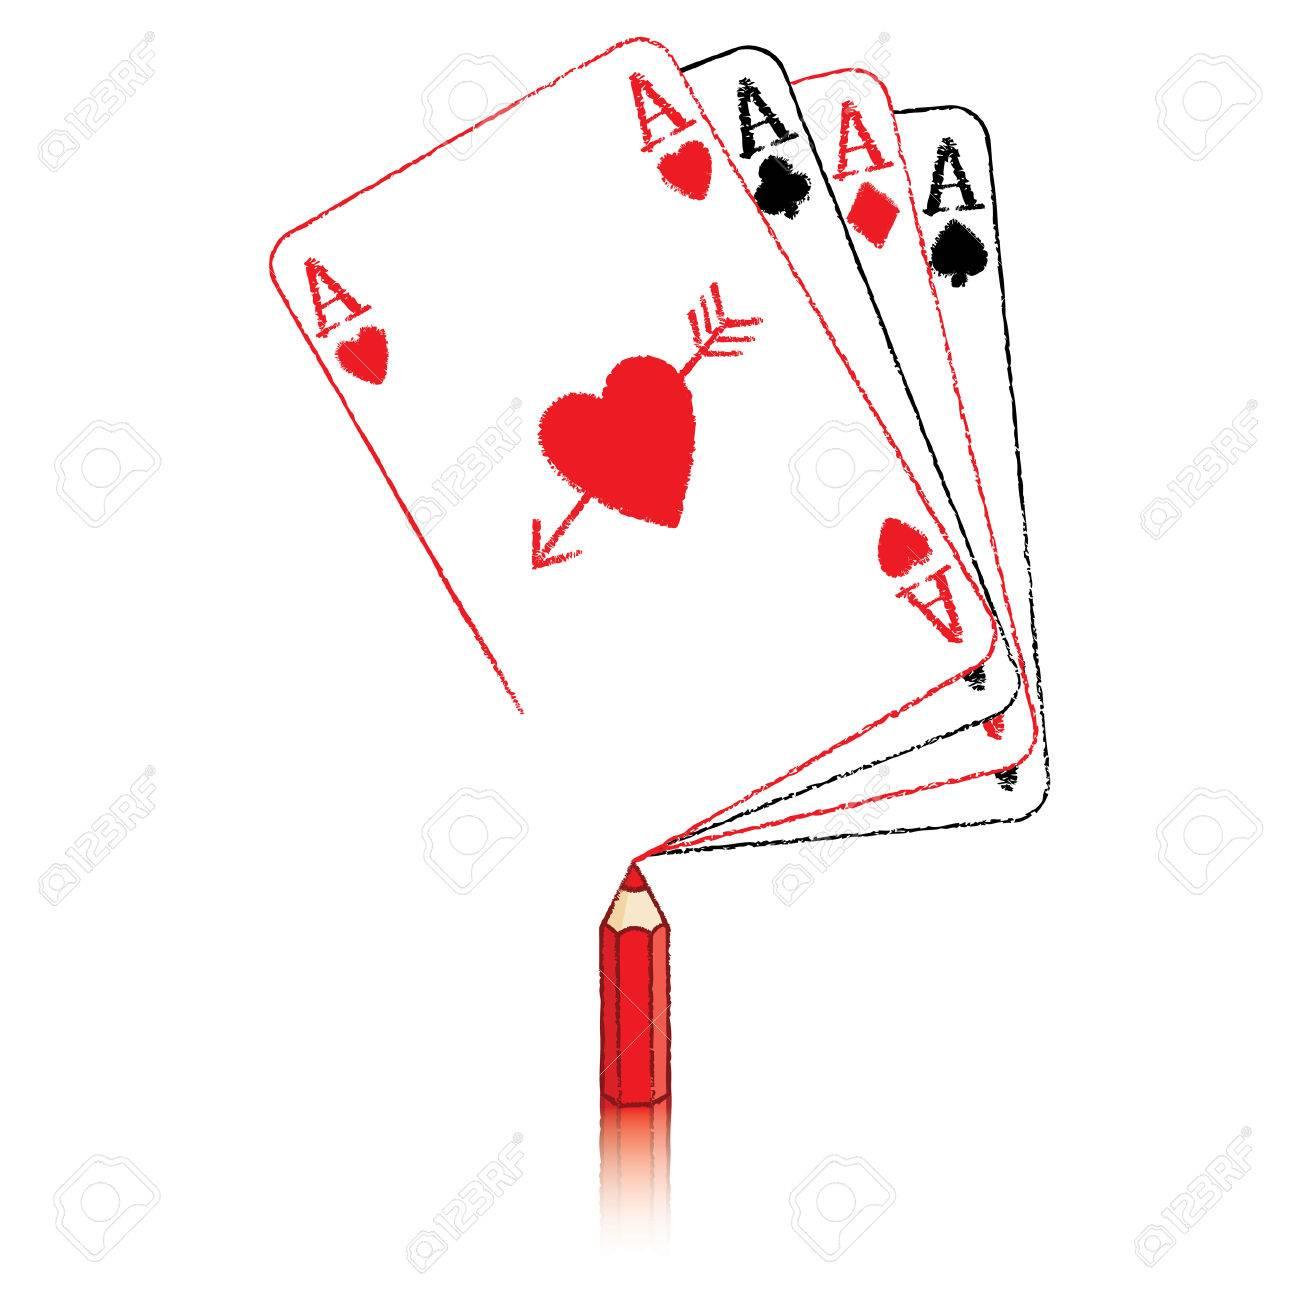 jeu de carte dessin Dessin Au Crayon Rouge Ace Of Hearts Carte De Jeu Sur Fan D'as